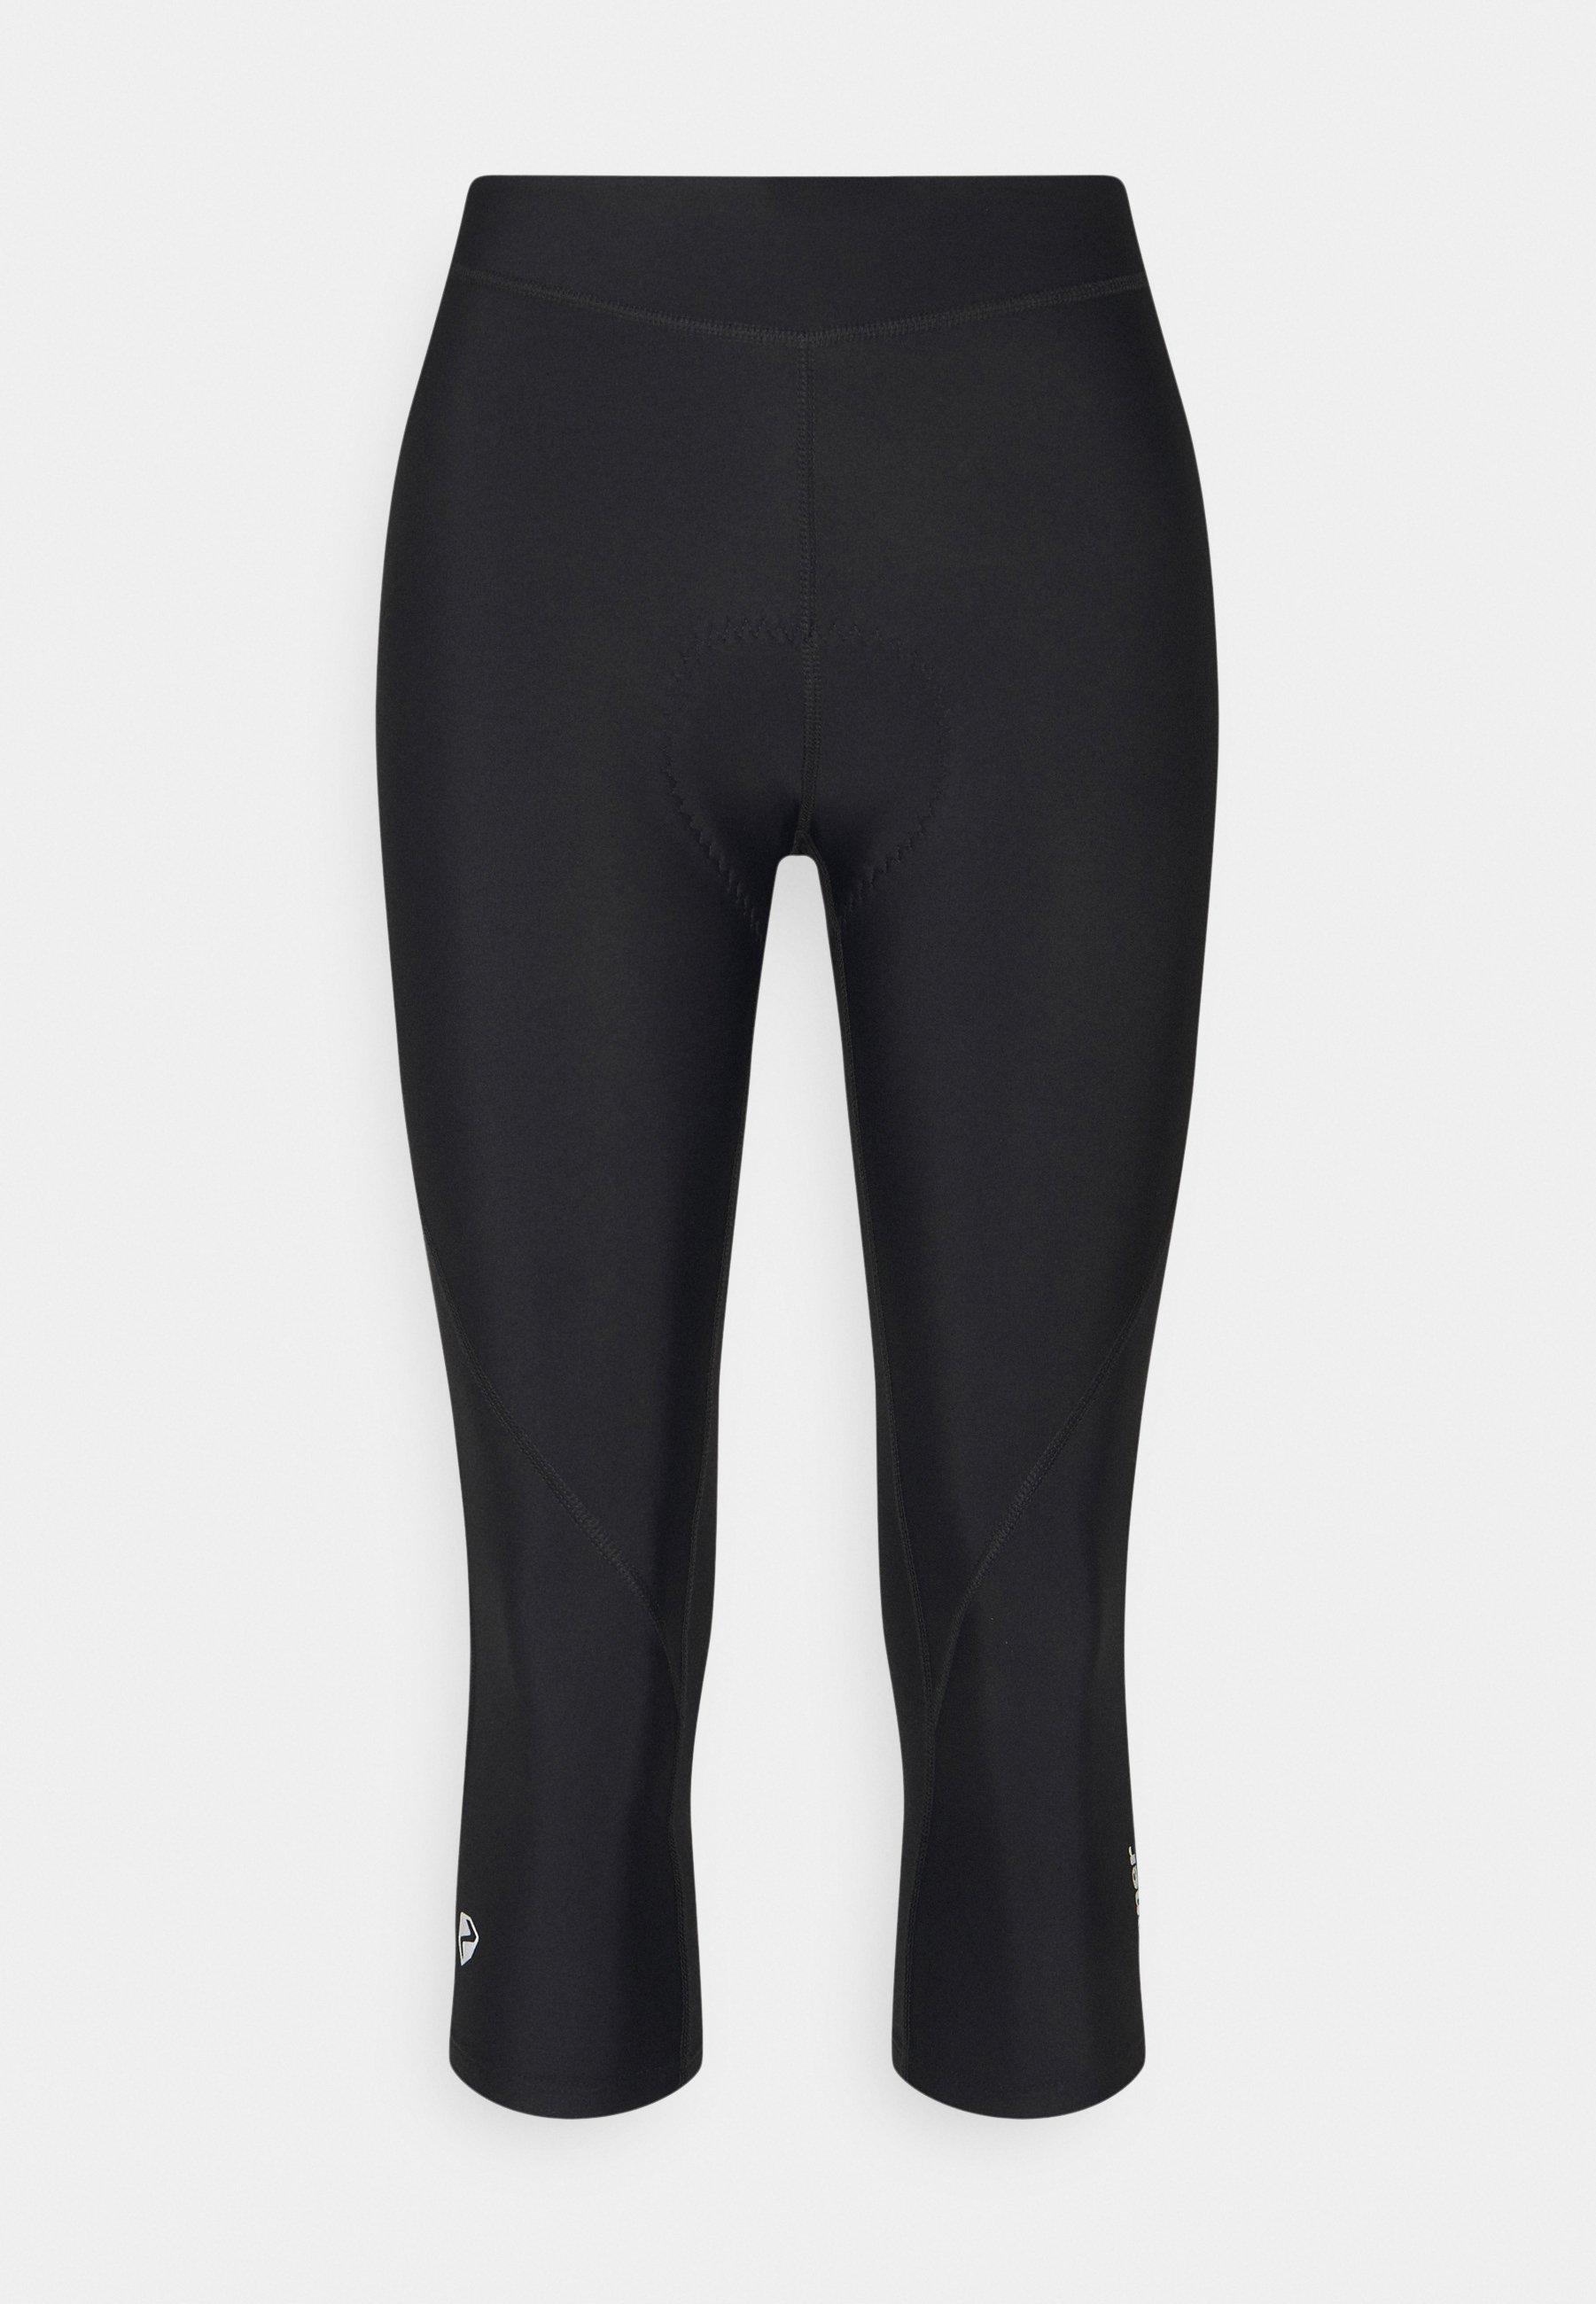 Femme NEBIA X FUNCTION LADY - Collants